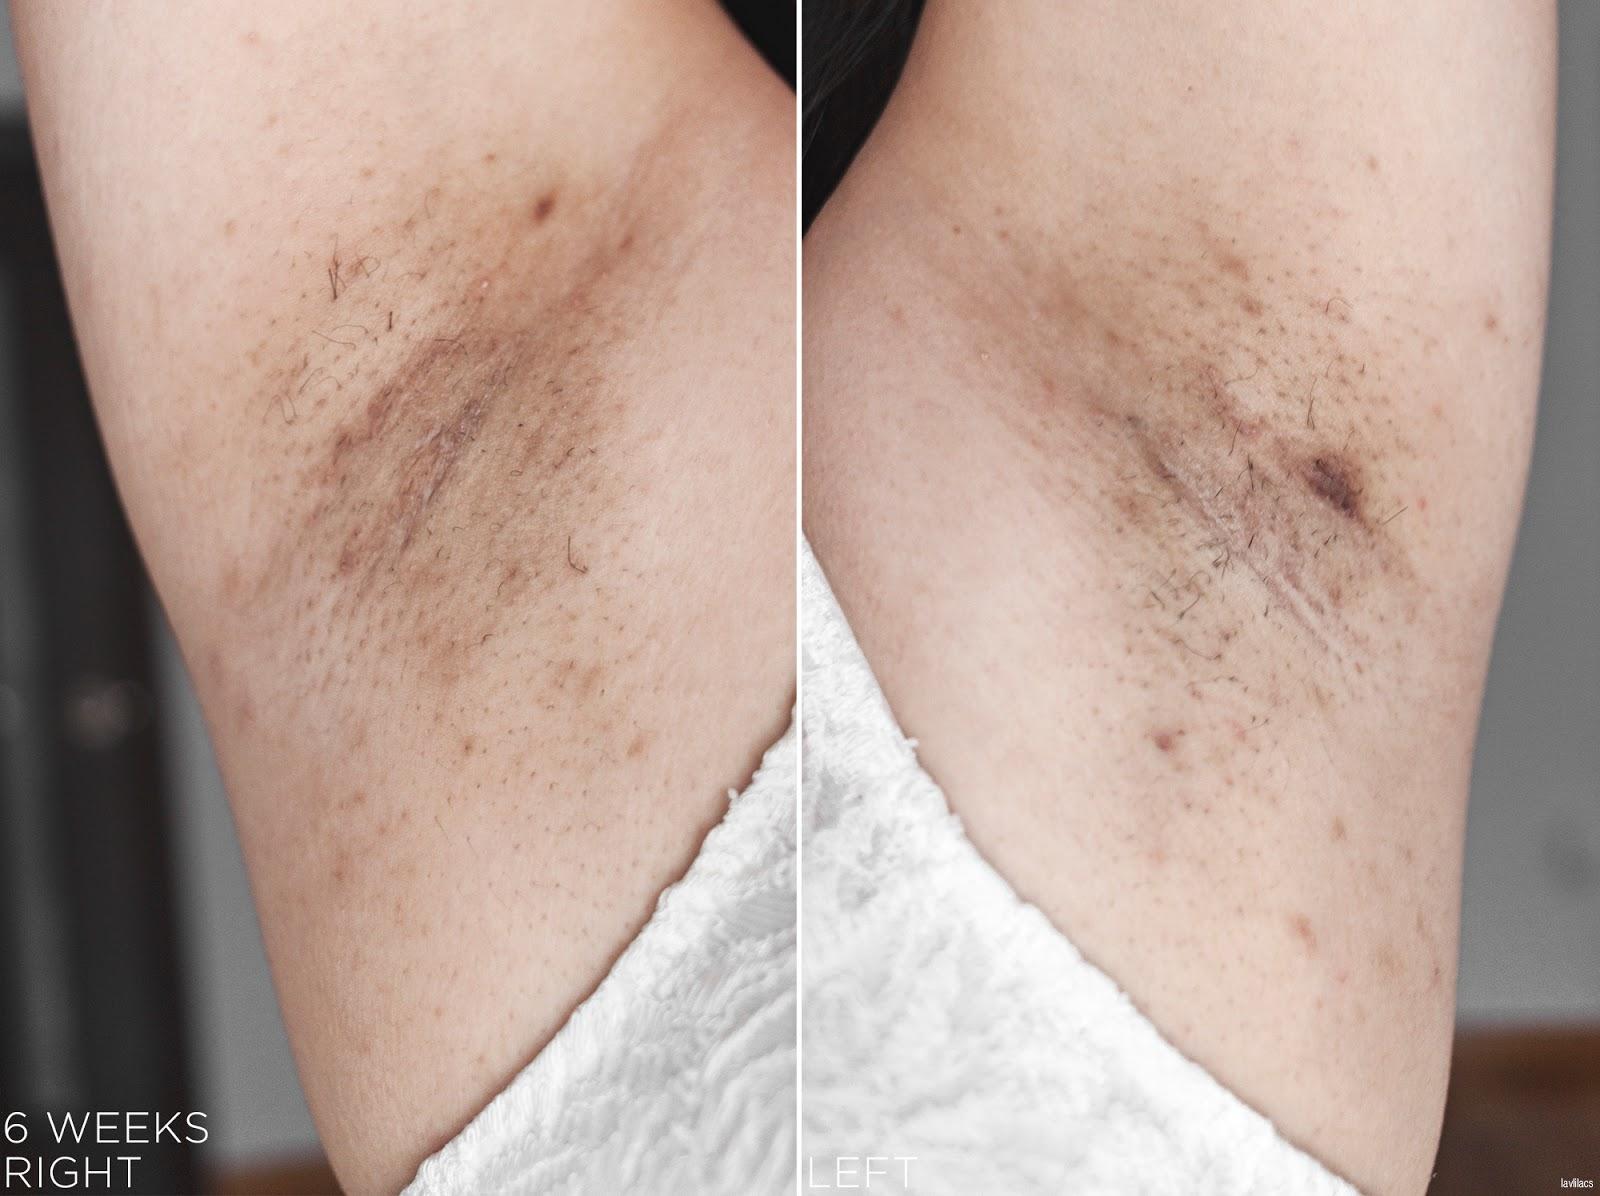 tria Hair Removal Laser Armpits Hair 6 Weeks